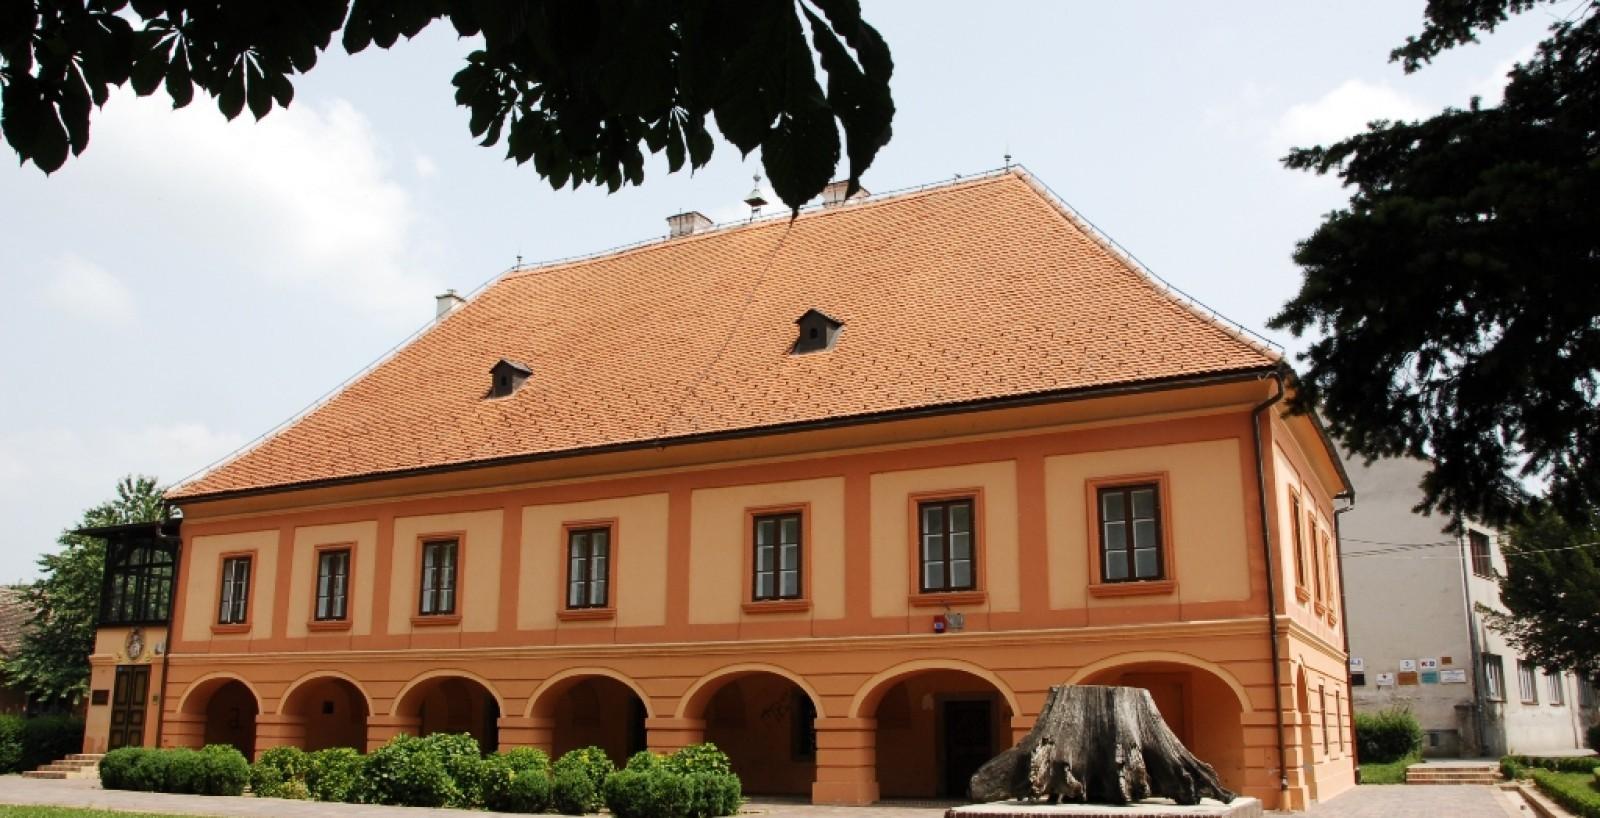 Turopolje museum